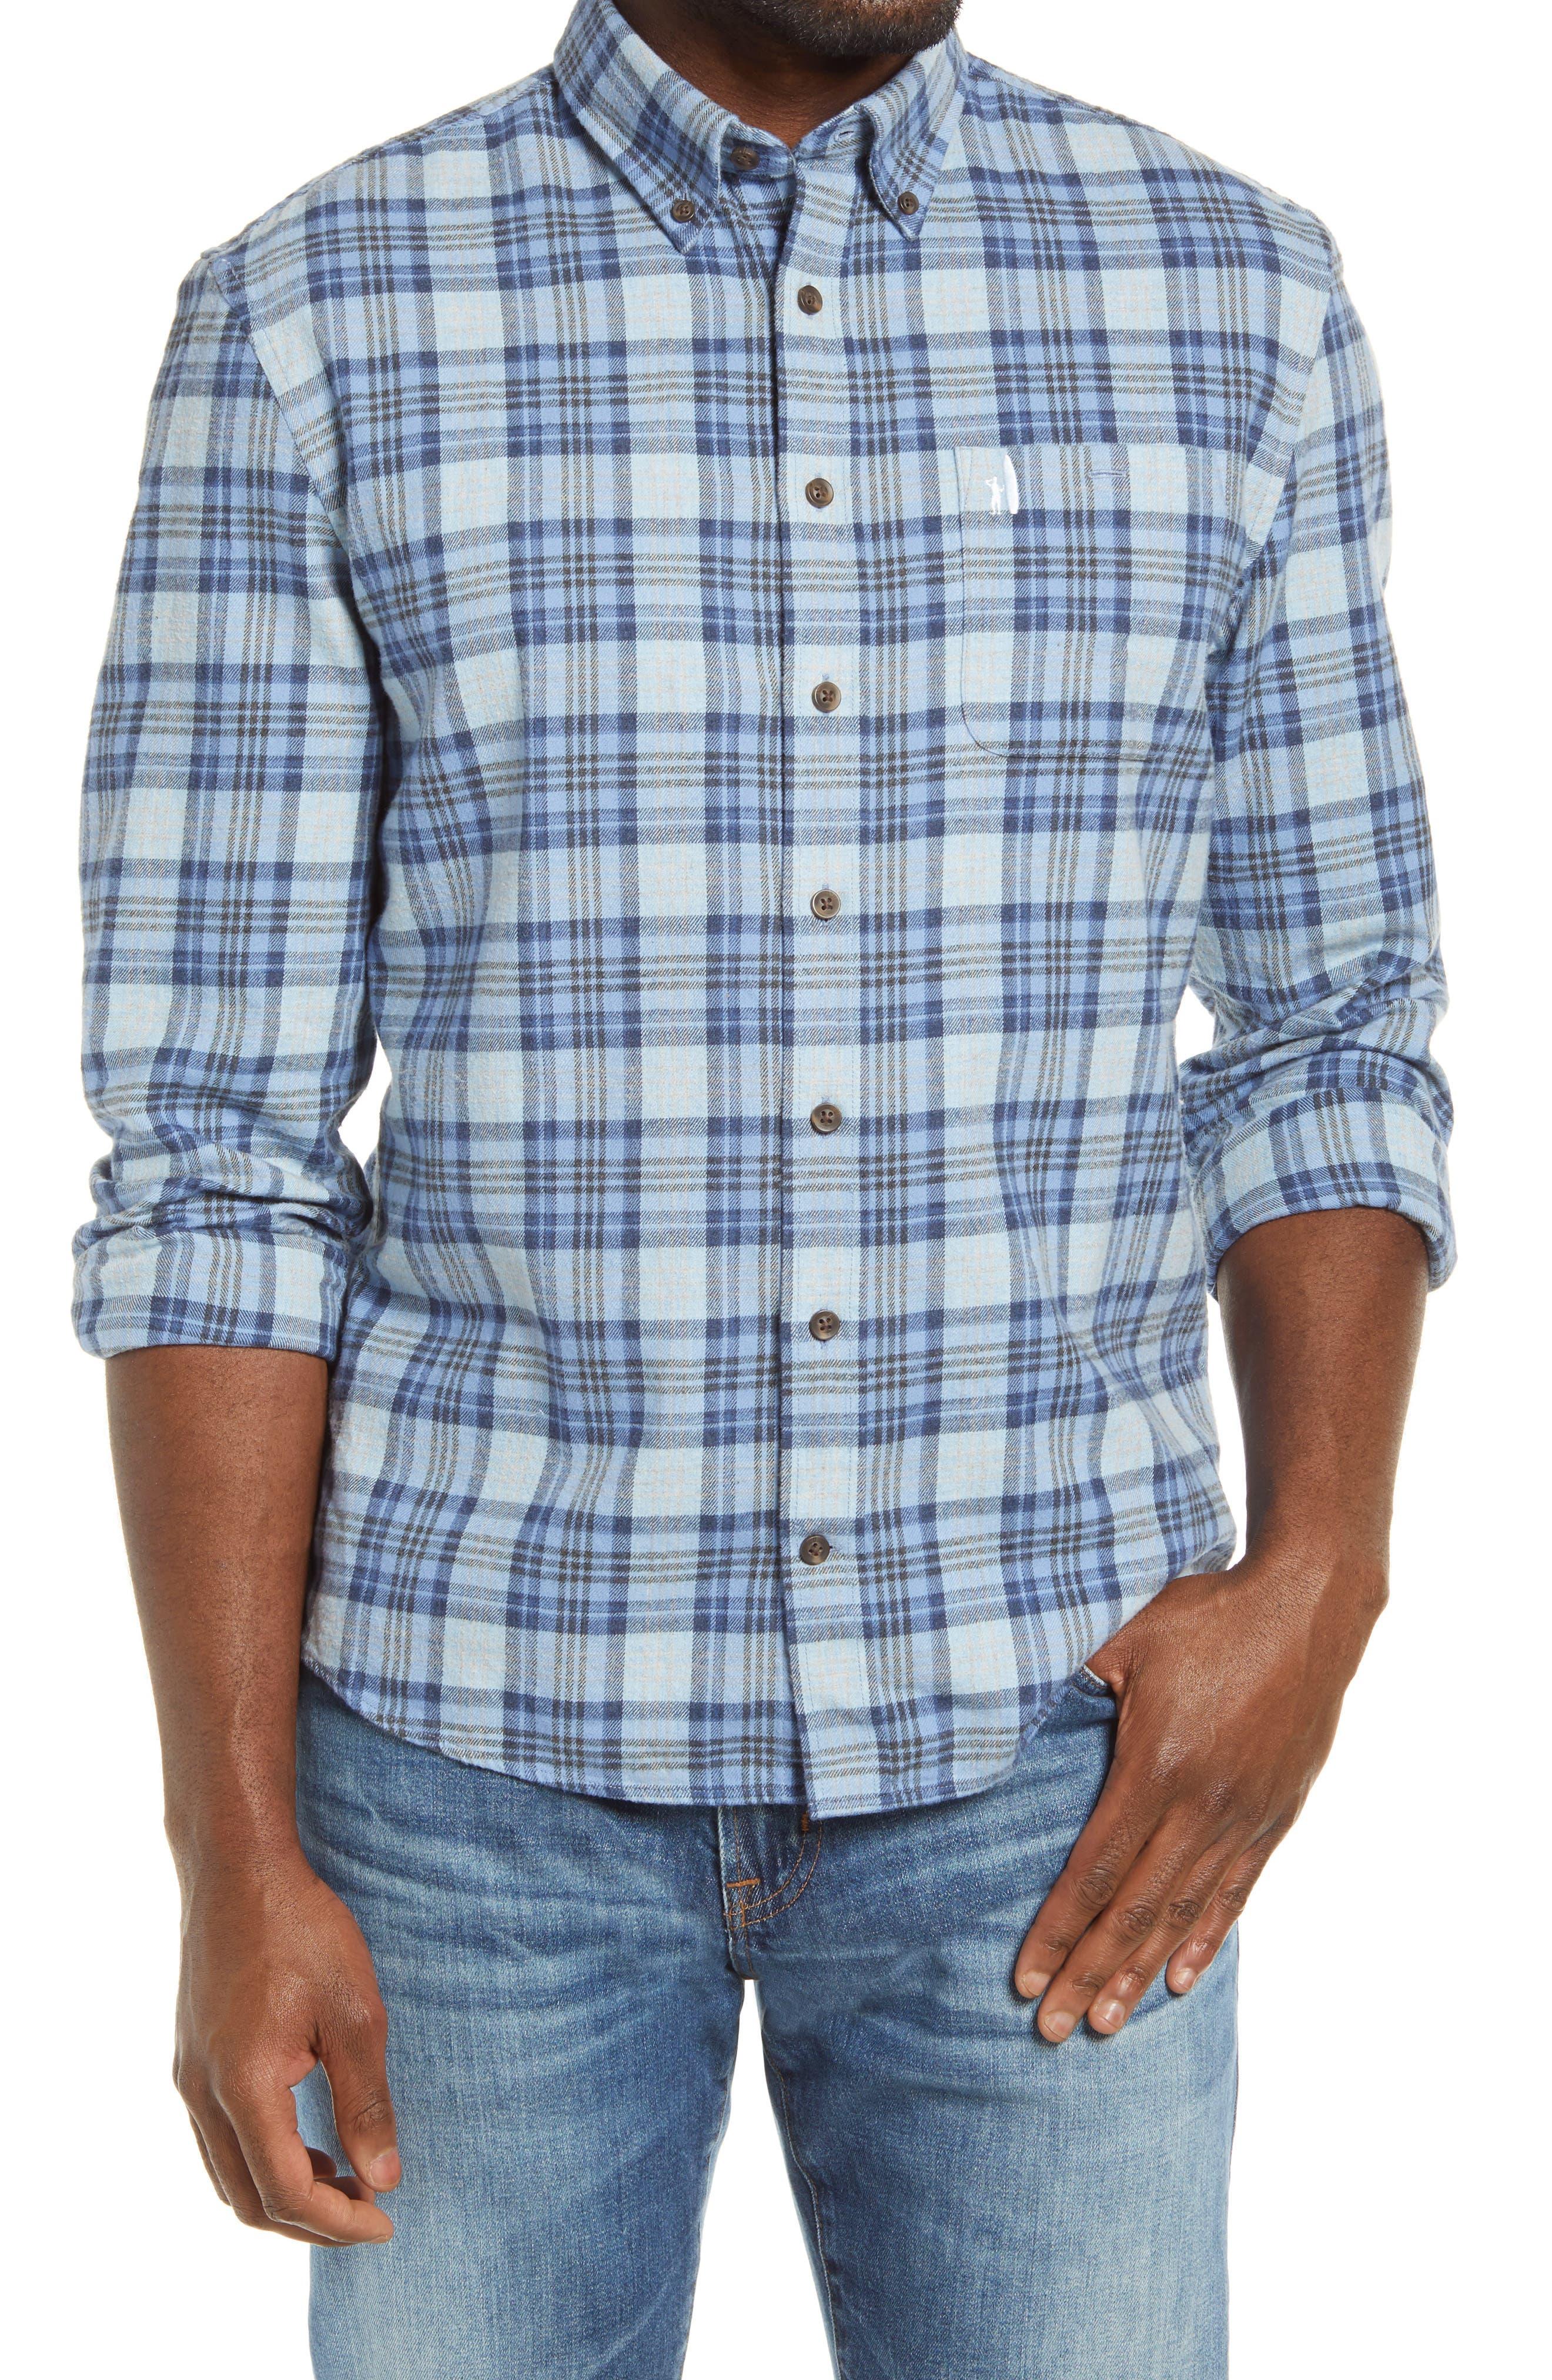 Hangin' Out Keller Plaid Flannel Button-Down Shirt